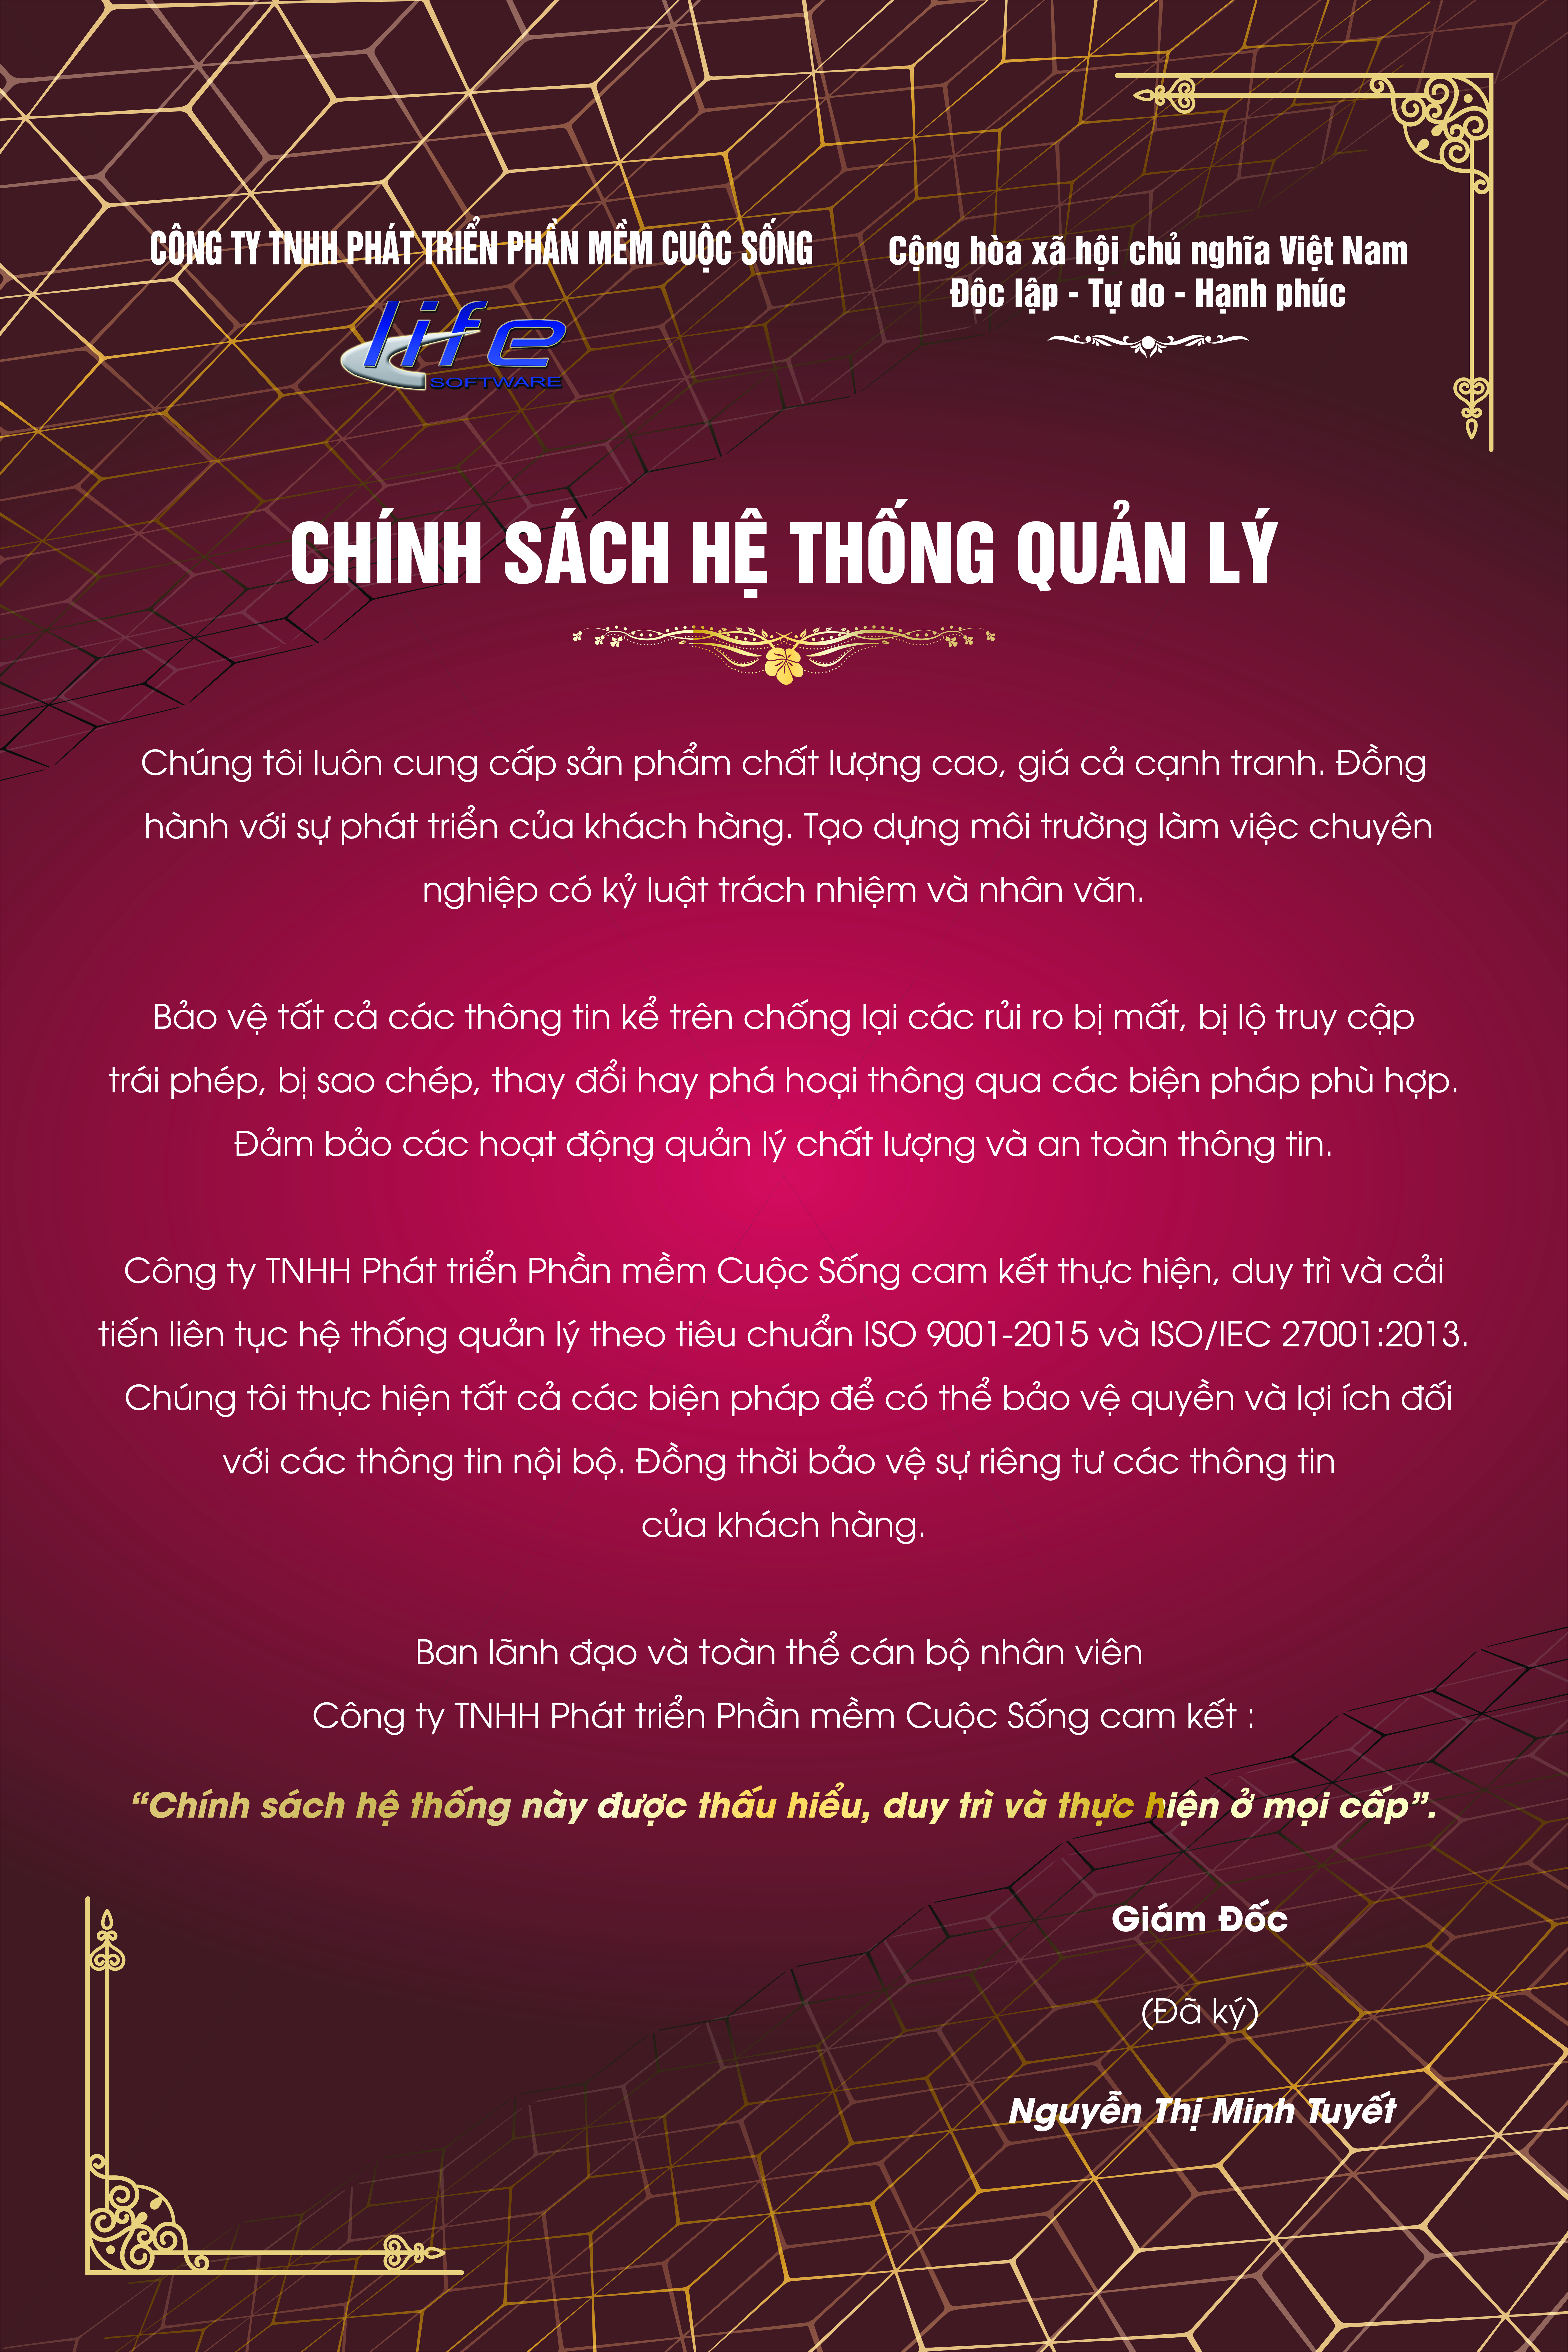 chinh-sach-he-thong-life